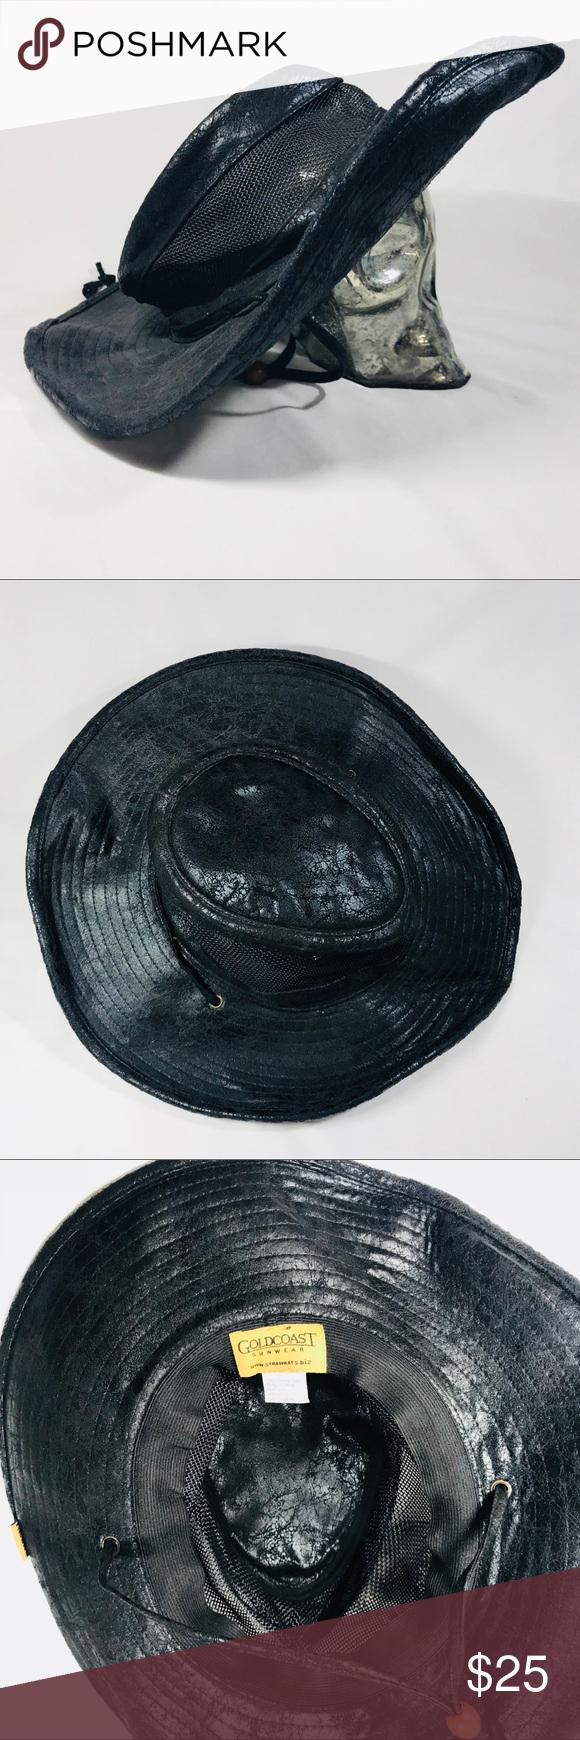 f3eaffc4aac18 GoldCoast Sunwear Black Wide Brim W Mesh Sun Hat GoldCoast Sunwear Black  Wide Brim W Mesh Sun Hat Gold Coast Accessories Hats